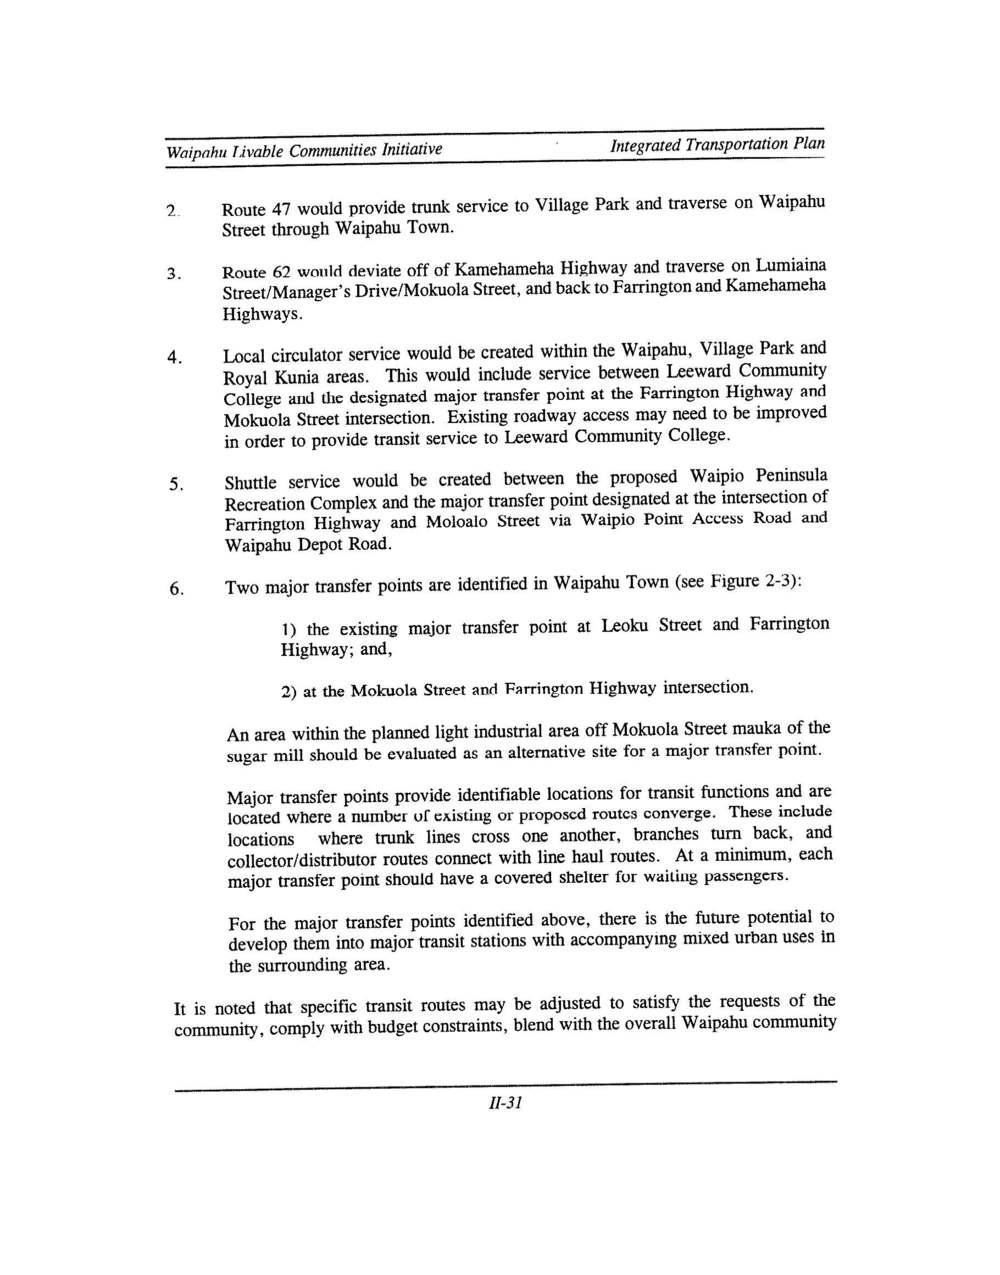 160531_WaipahuLivableCommunities(1998)_Page_046.jpg